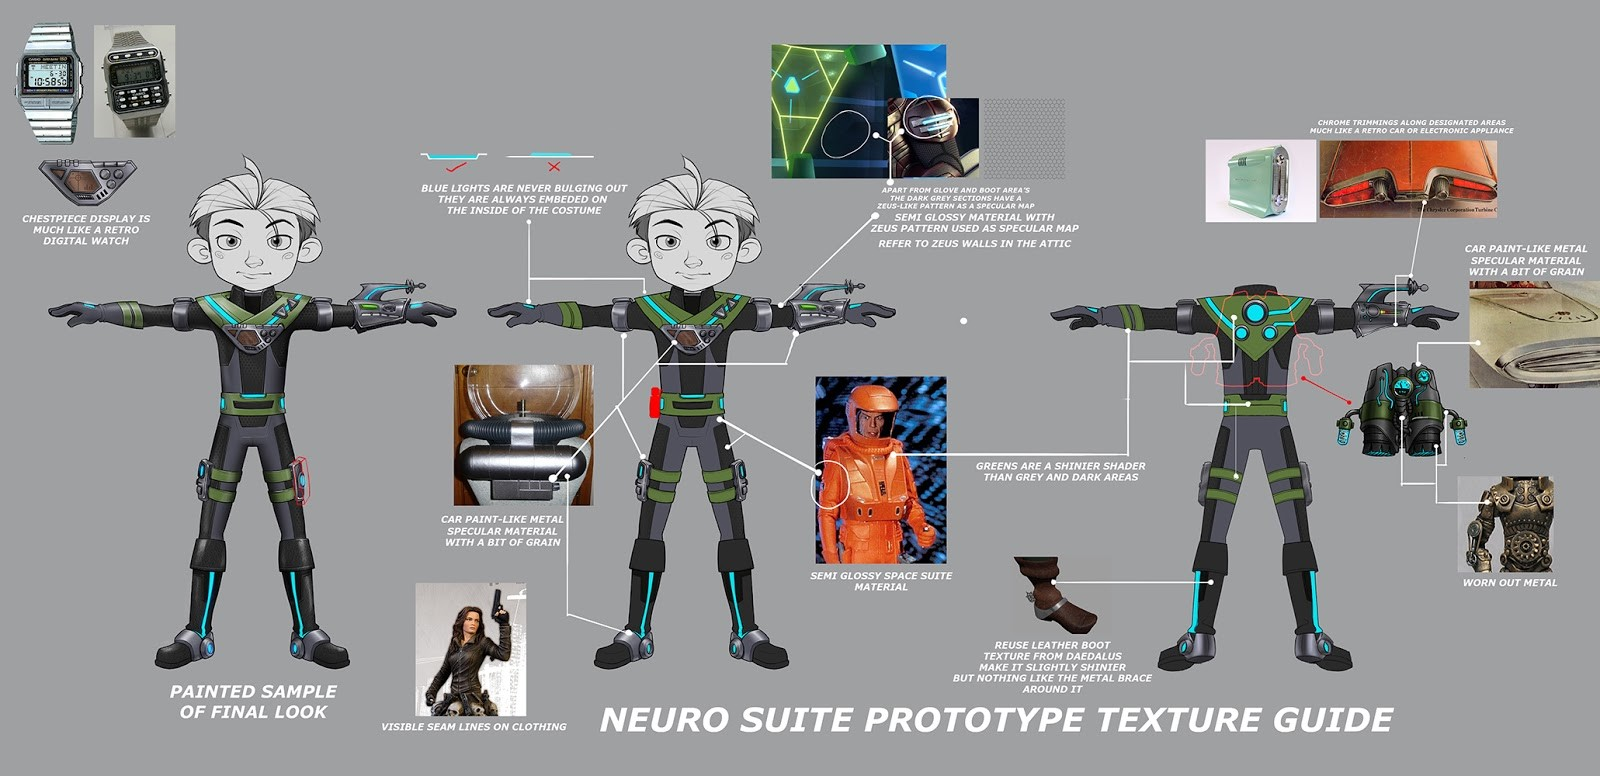 Jose cua neuro suite prototype texture guide